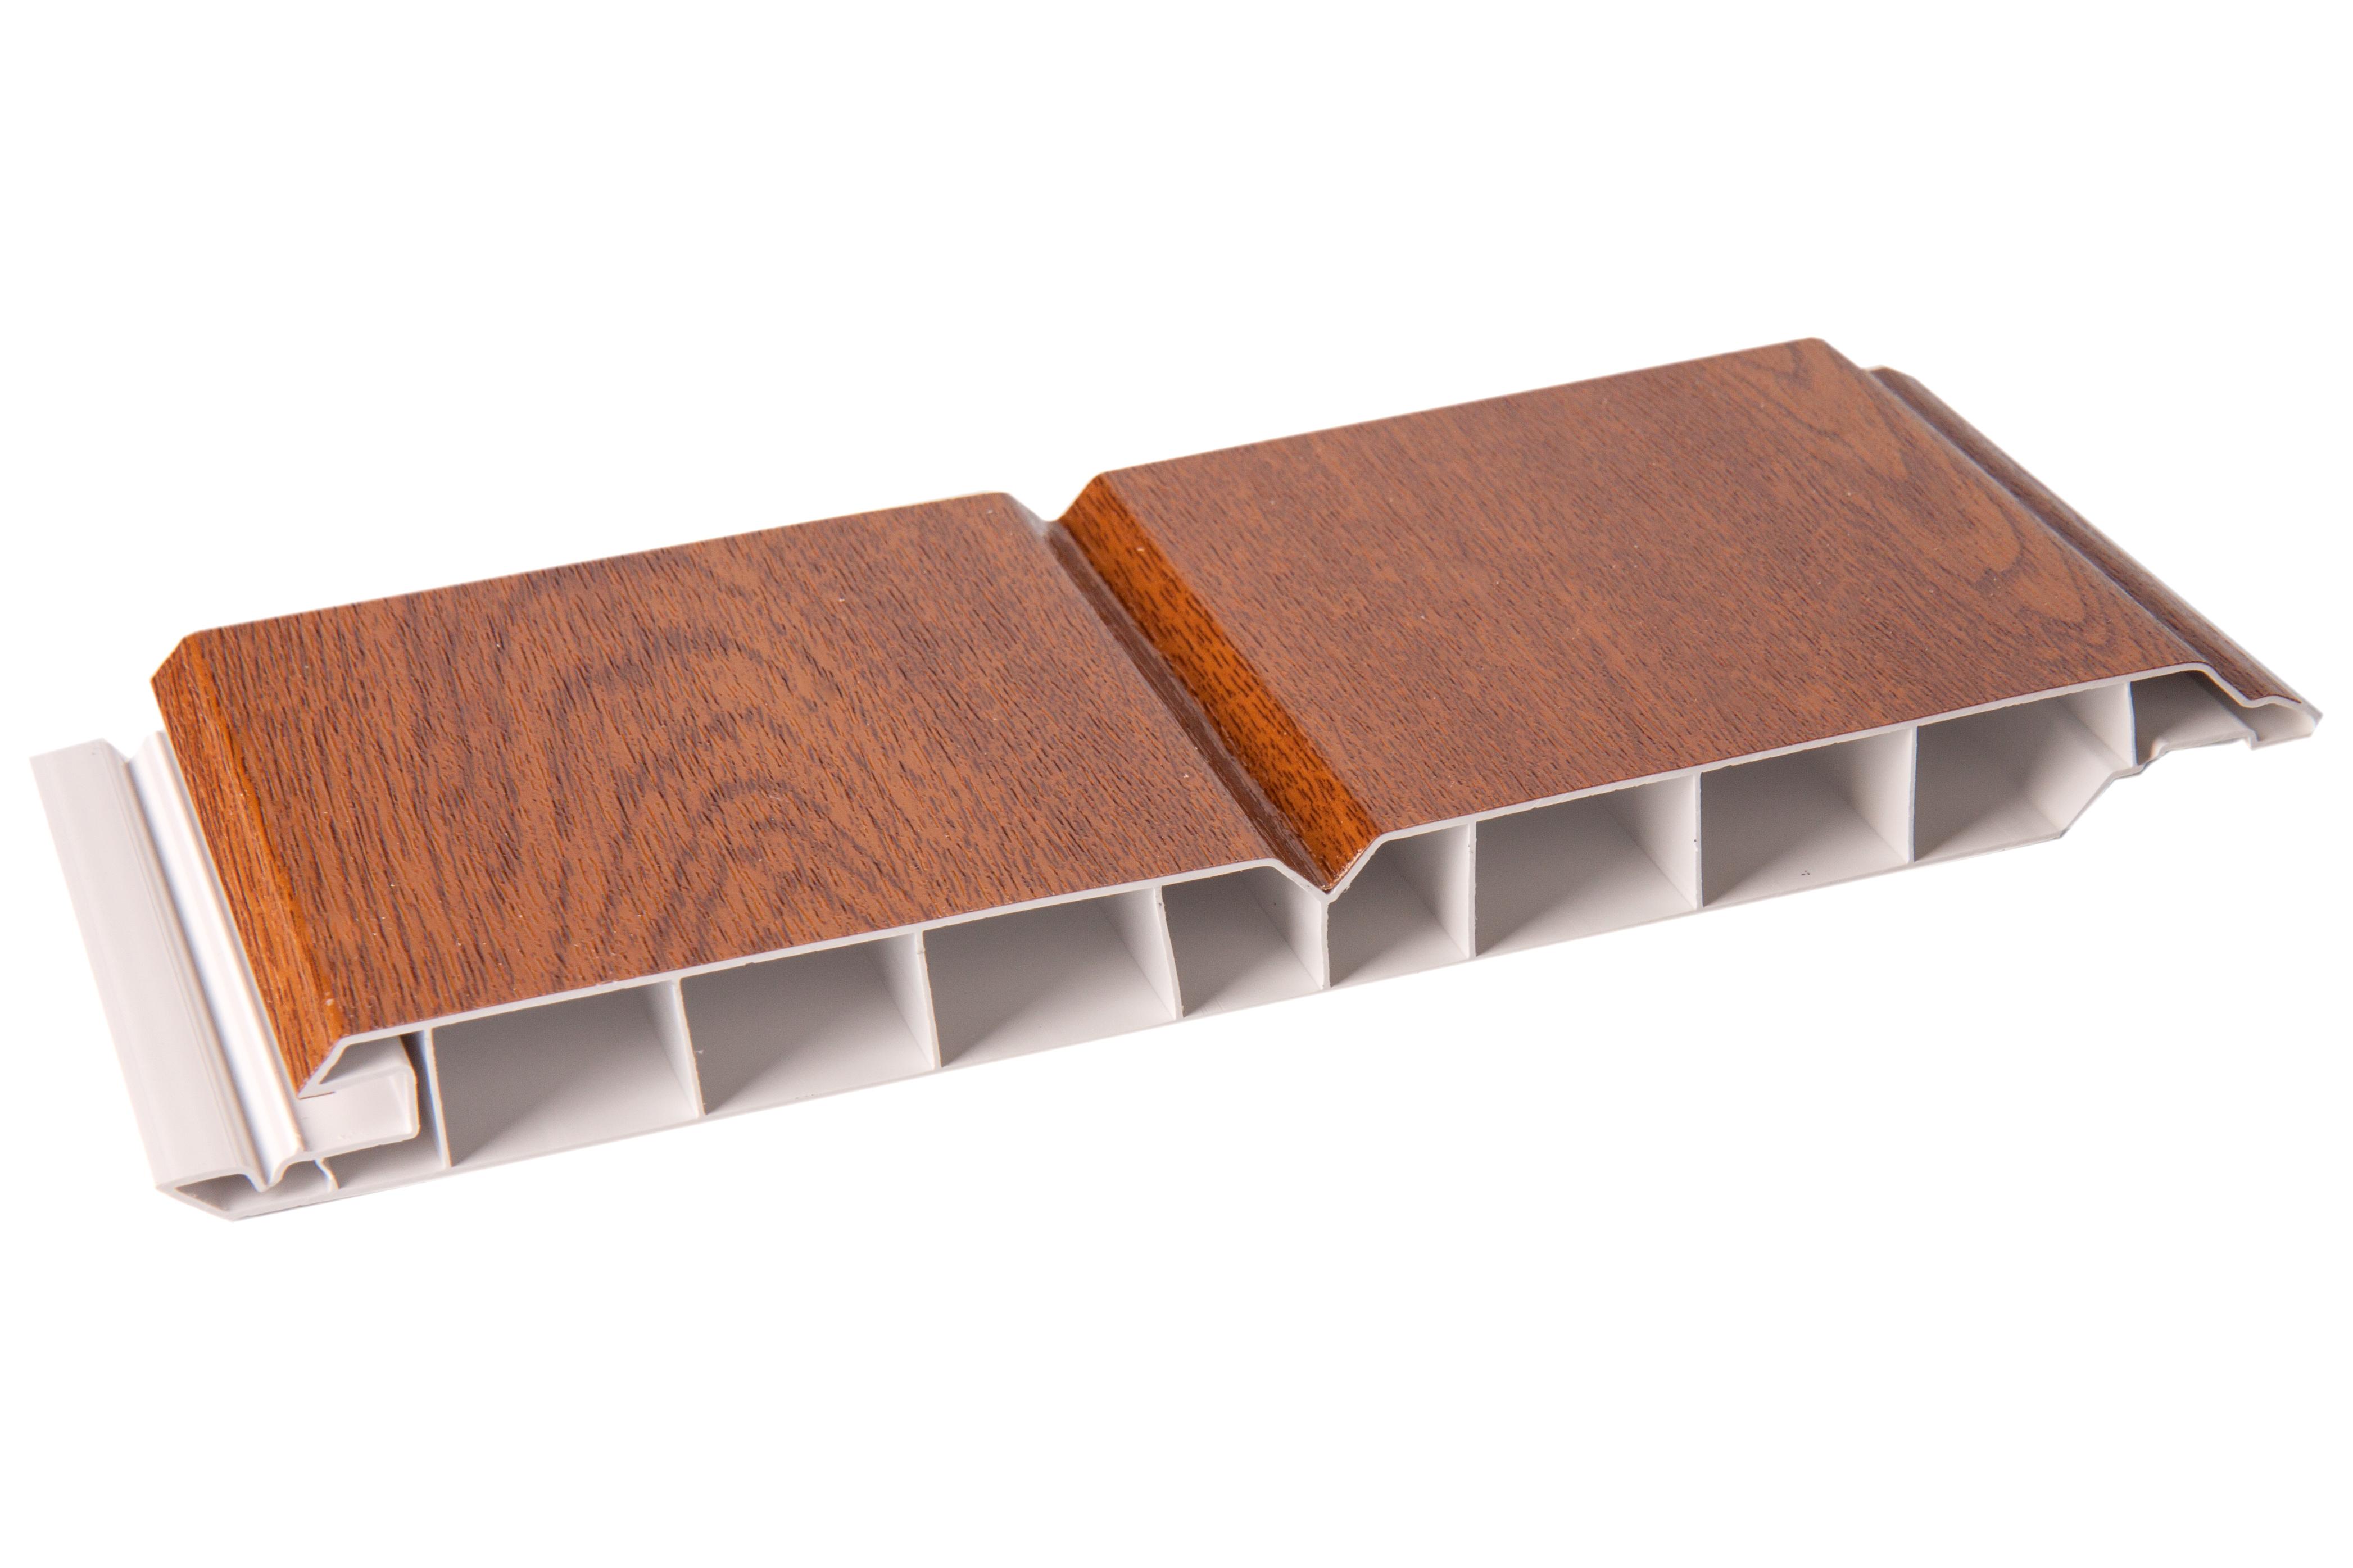 paneele wand und decke 17 200mm golden oak. Black Bedroom Furniture Sets. Home Design Ideas